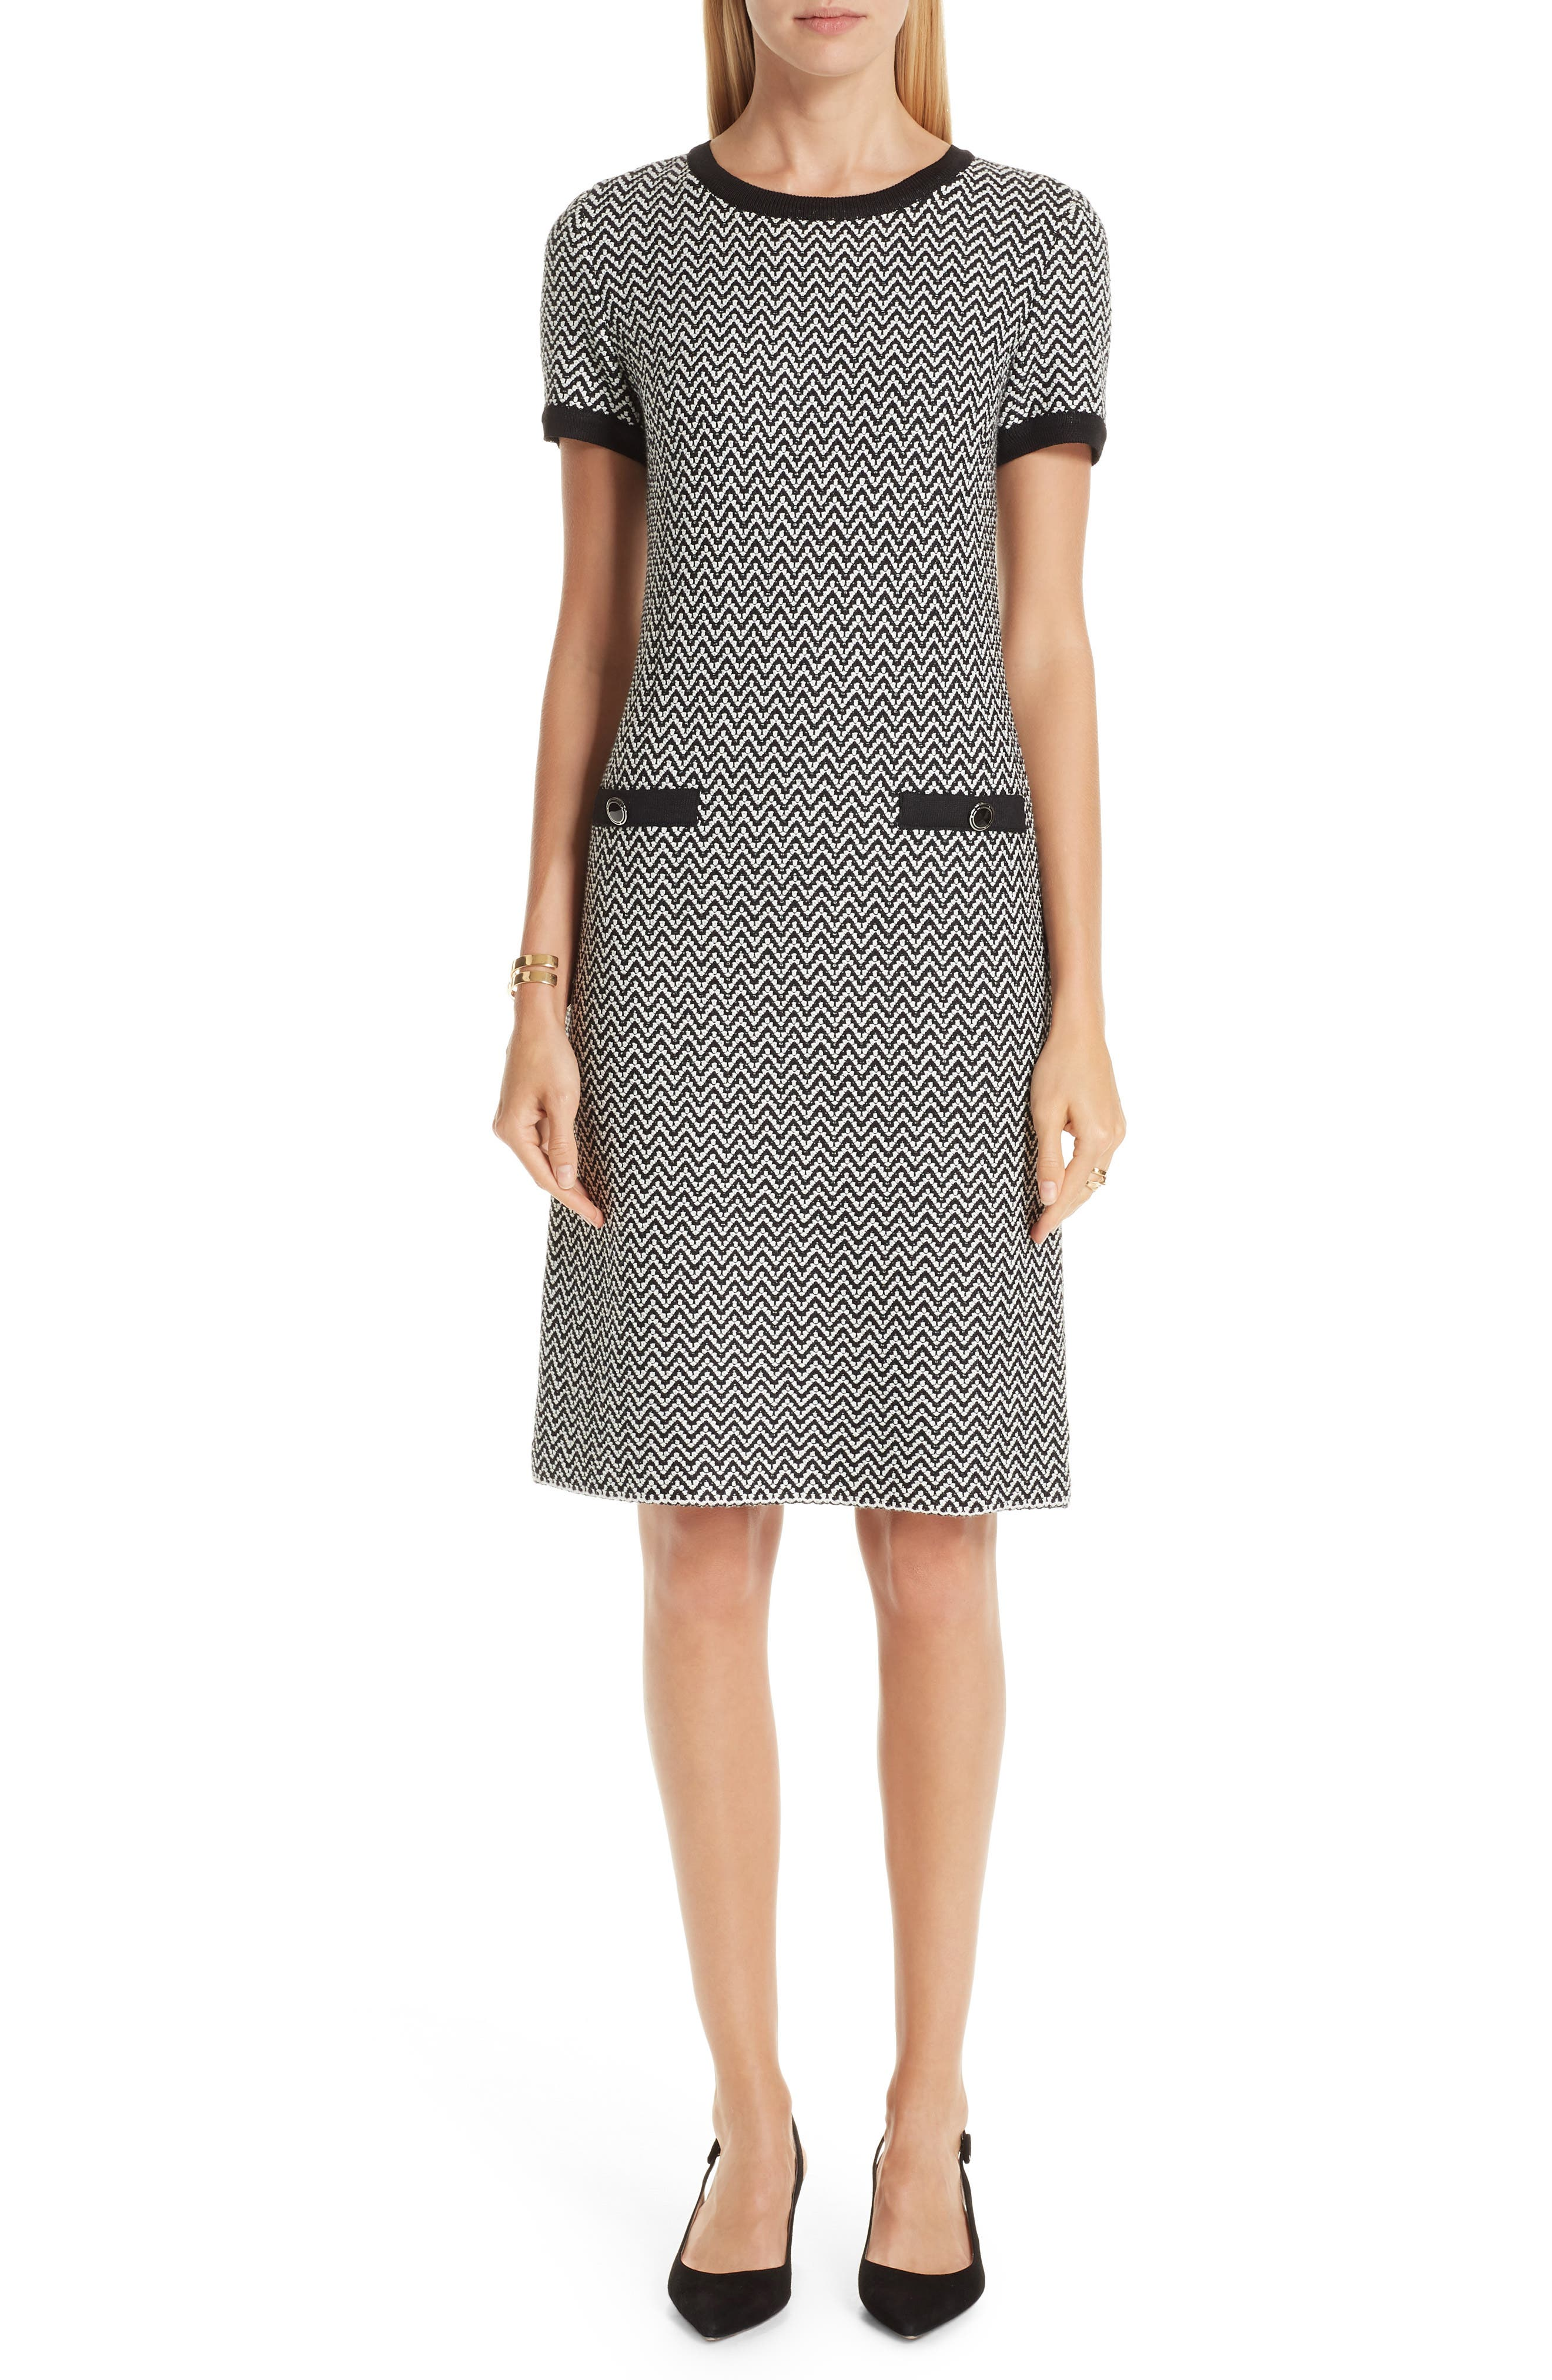 St. John Collection Mod Herringbone Knit Dress, Black